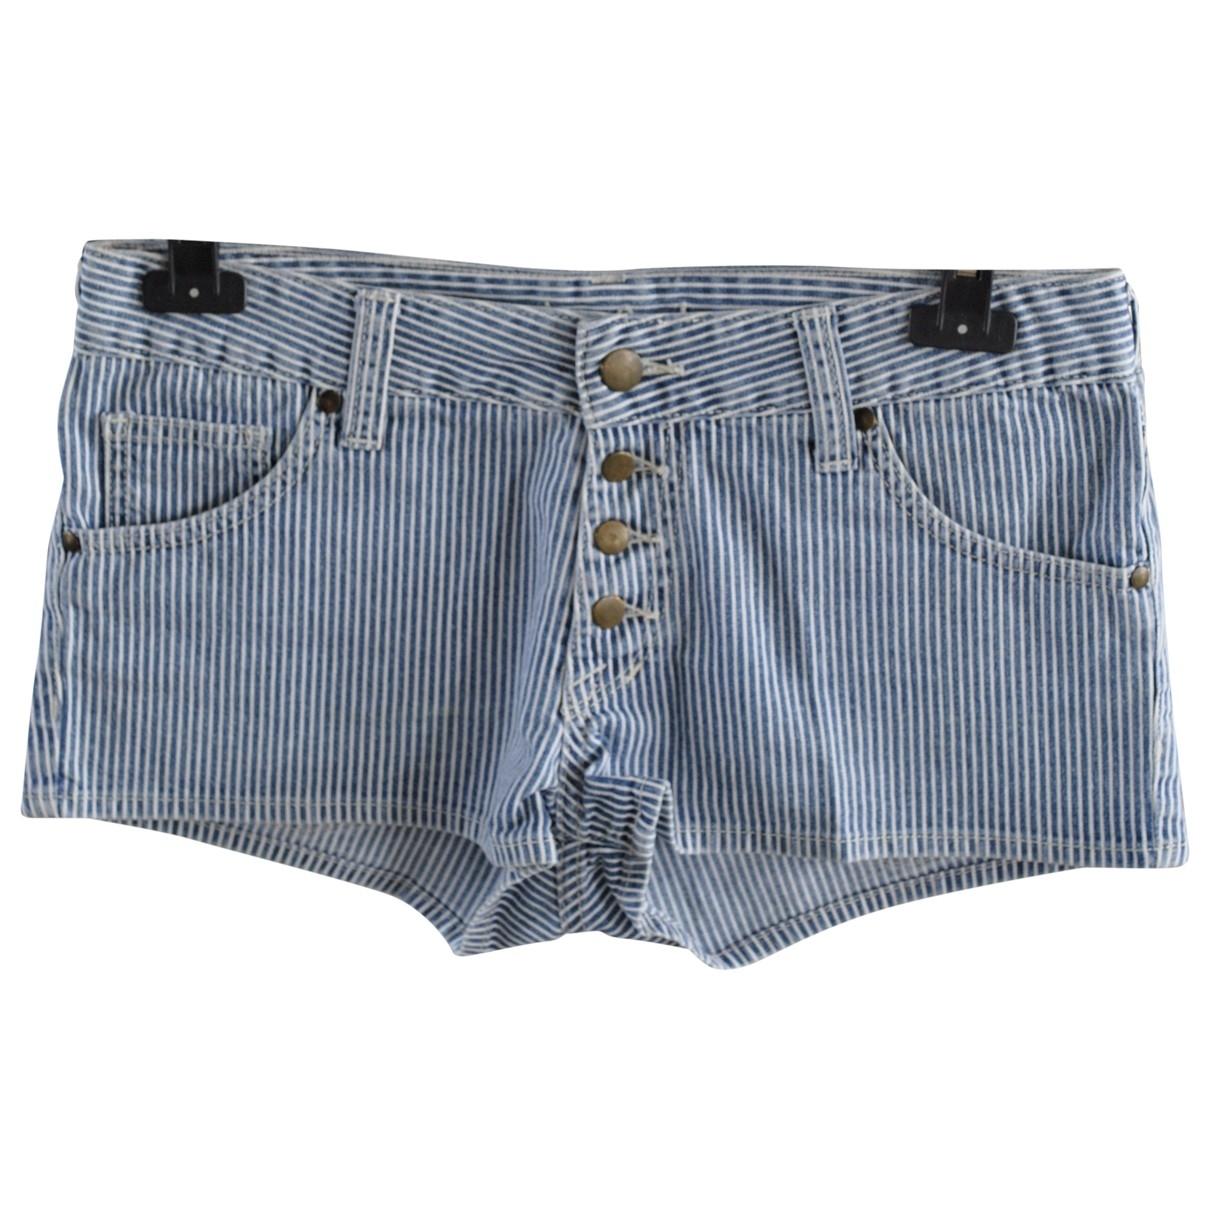 Ba&sh \N Shorts in Baumwolle - Elasthan